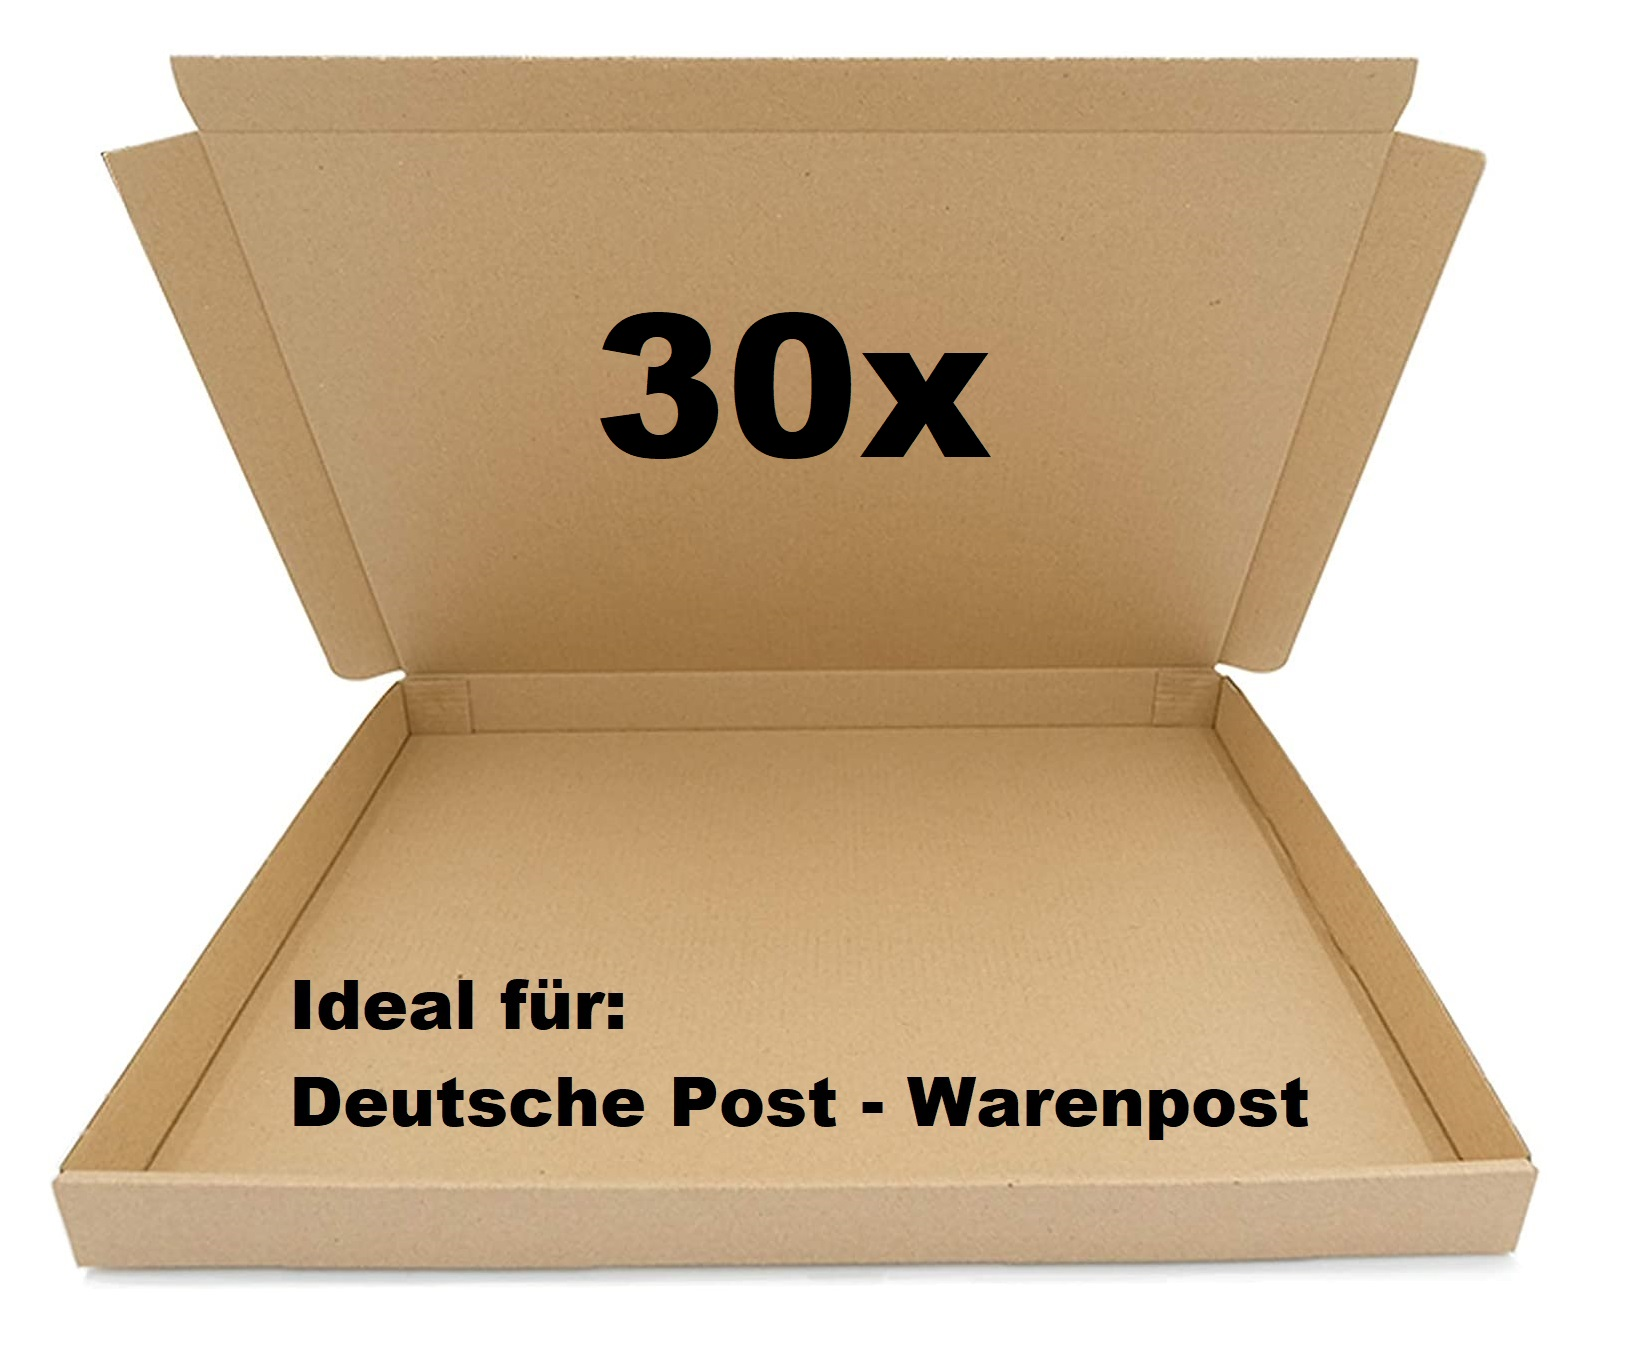 30x SAD Warenpostkartons 350x250x30mm Karton für Warenpost International XS geeignet - DIN A4 Format